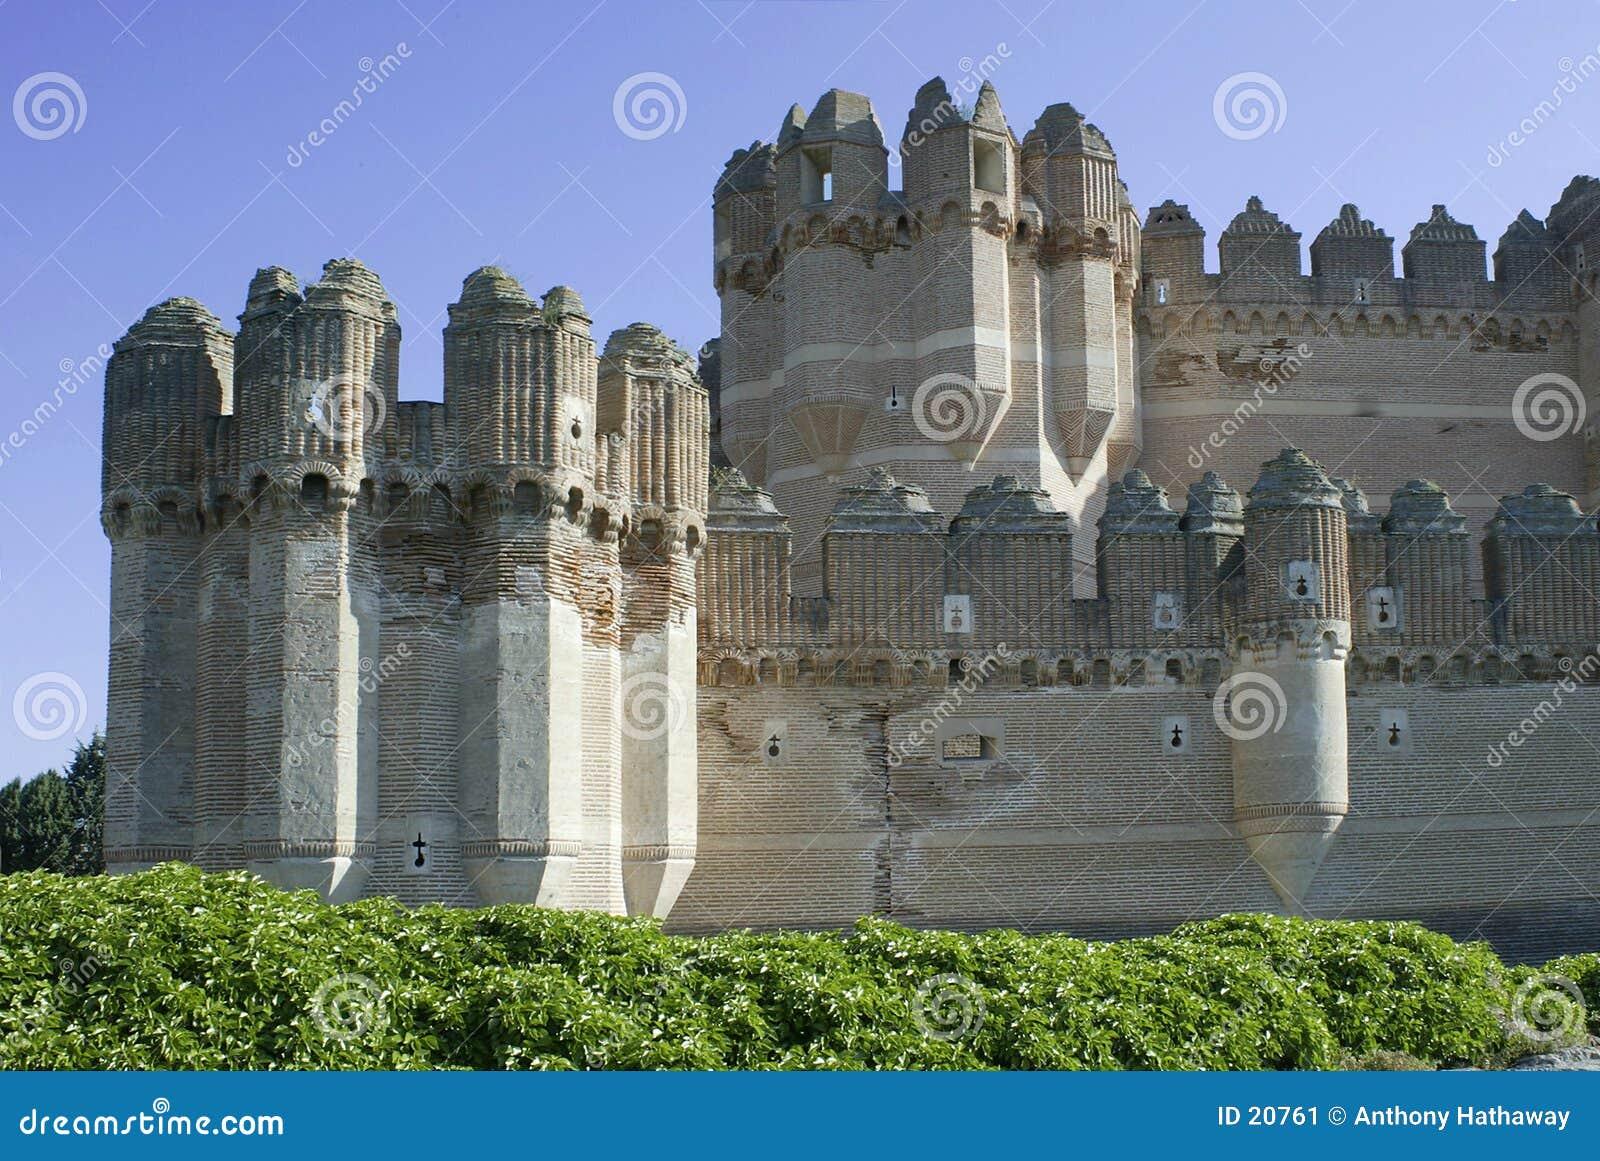 Castillo古柯de